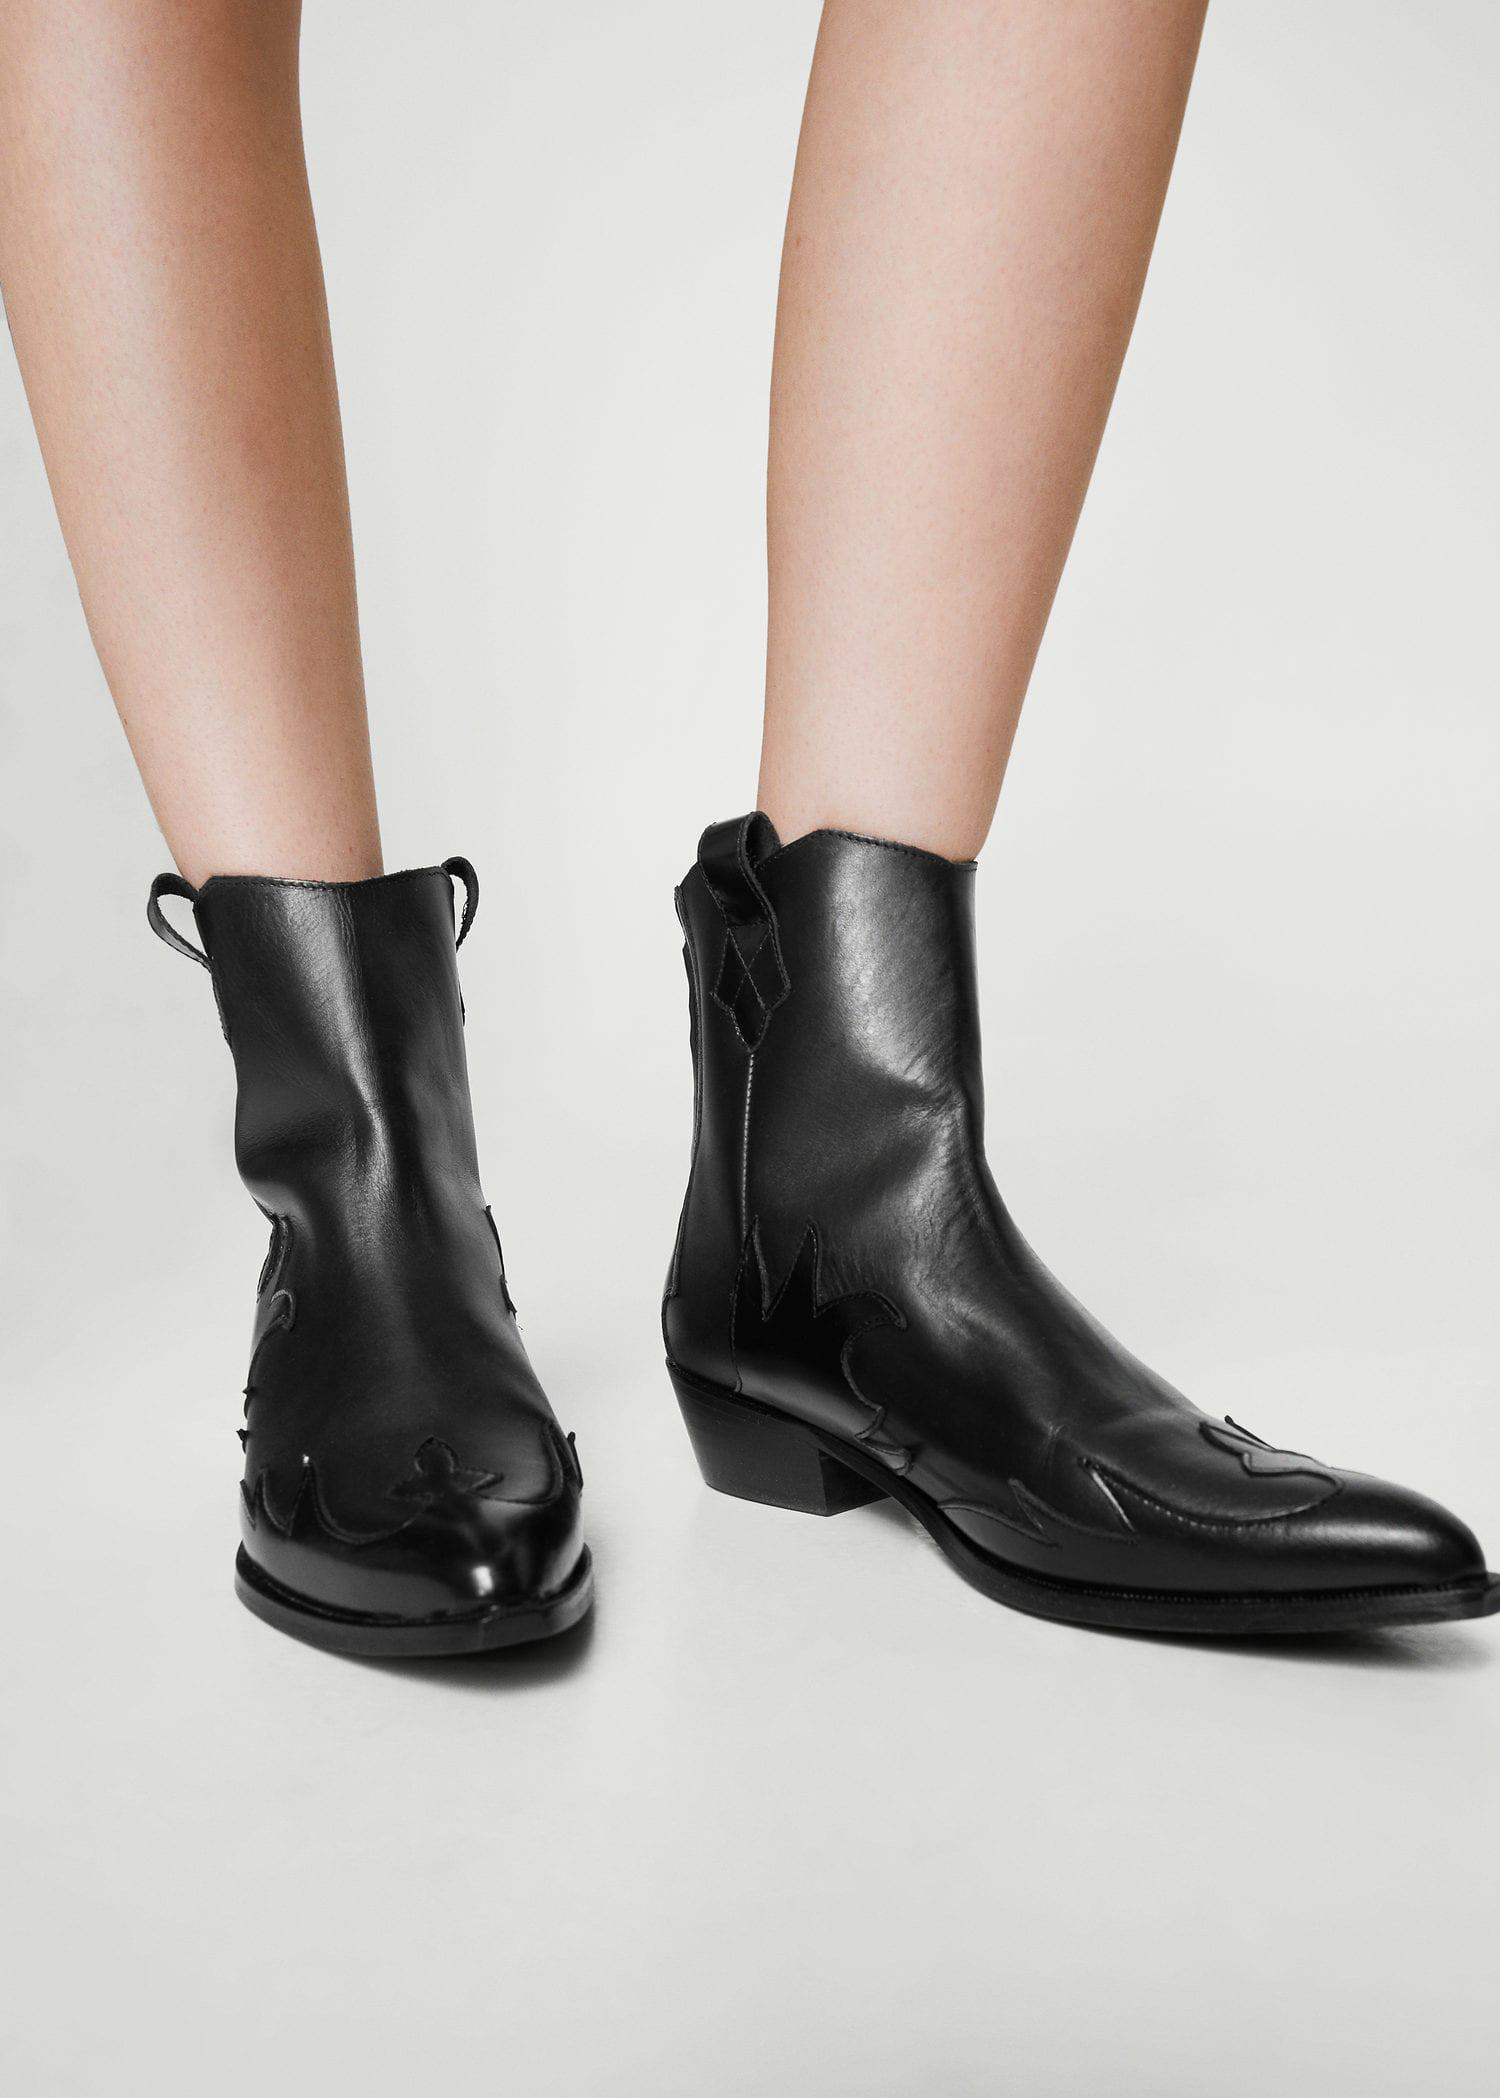 9bbbde3b1a3 Mango Black Leather Cowboy Ankle Boots